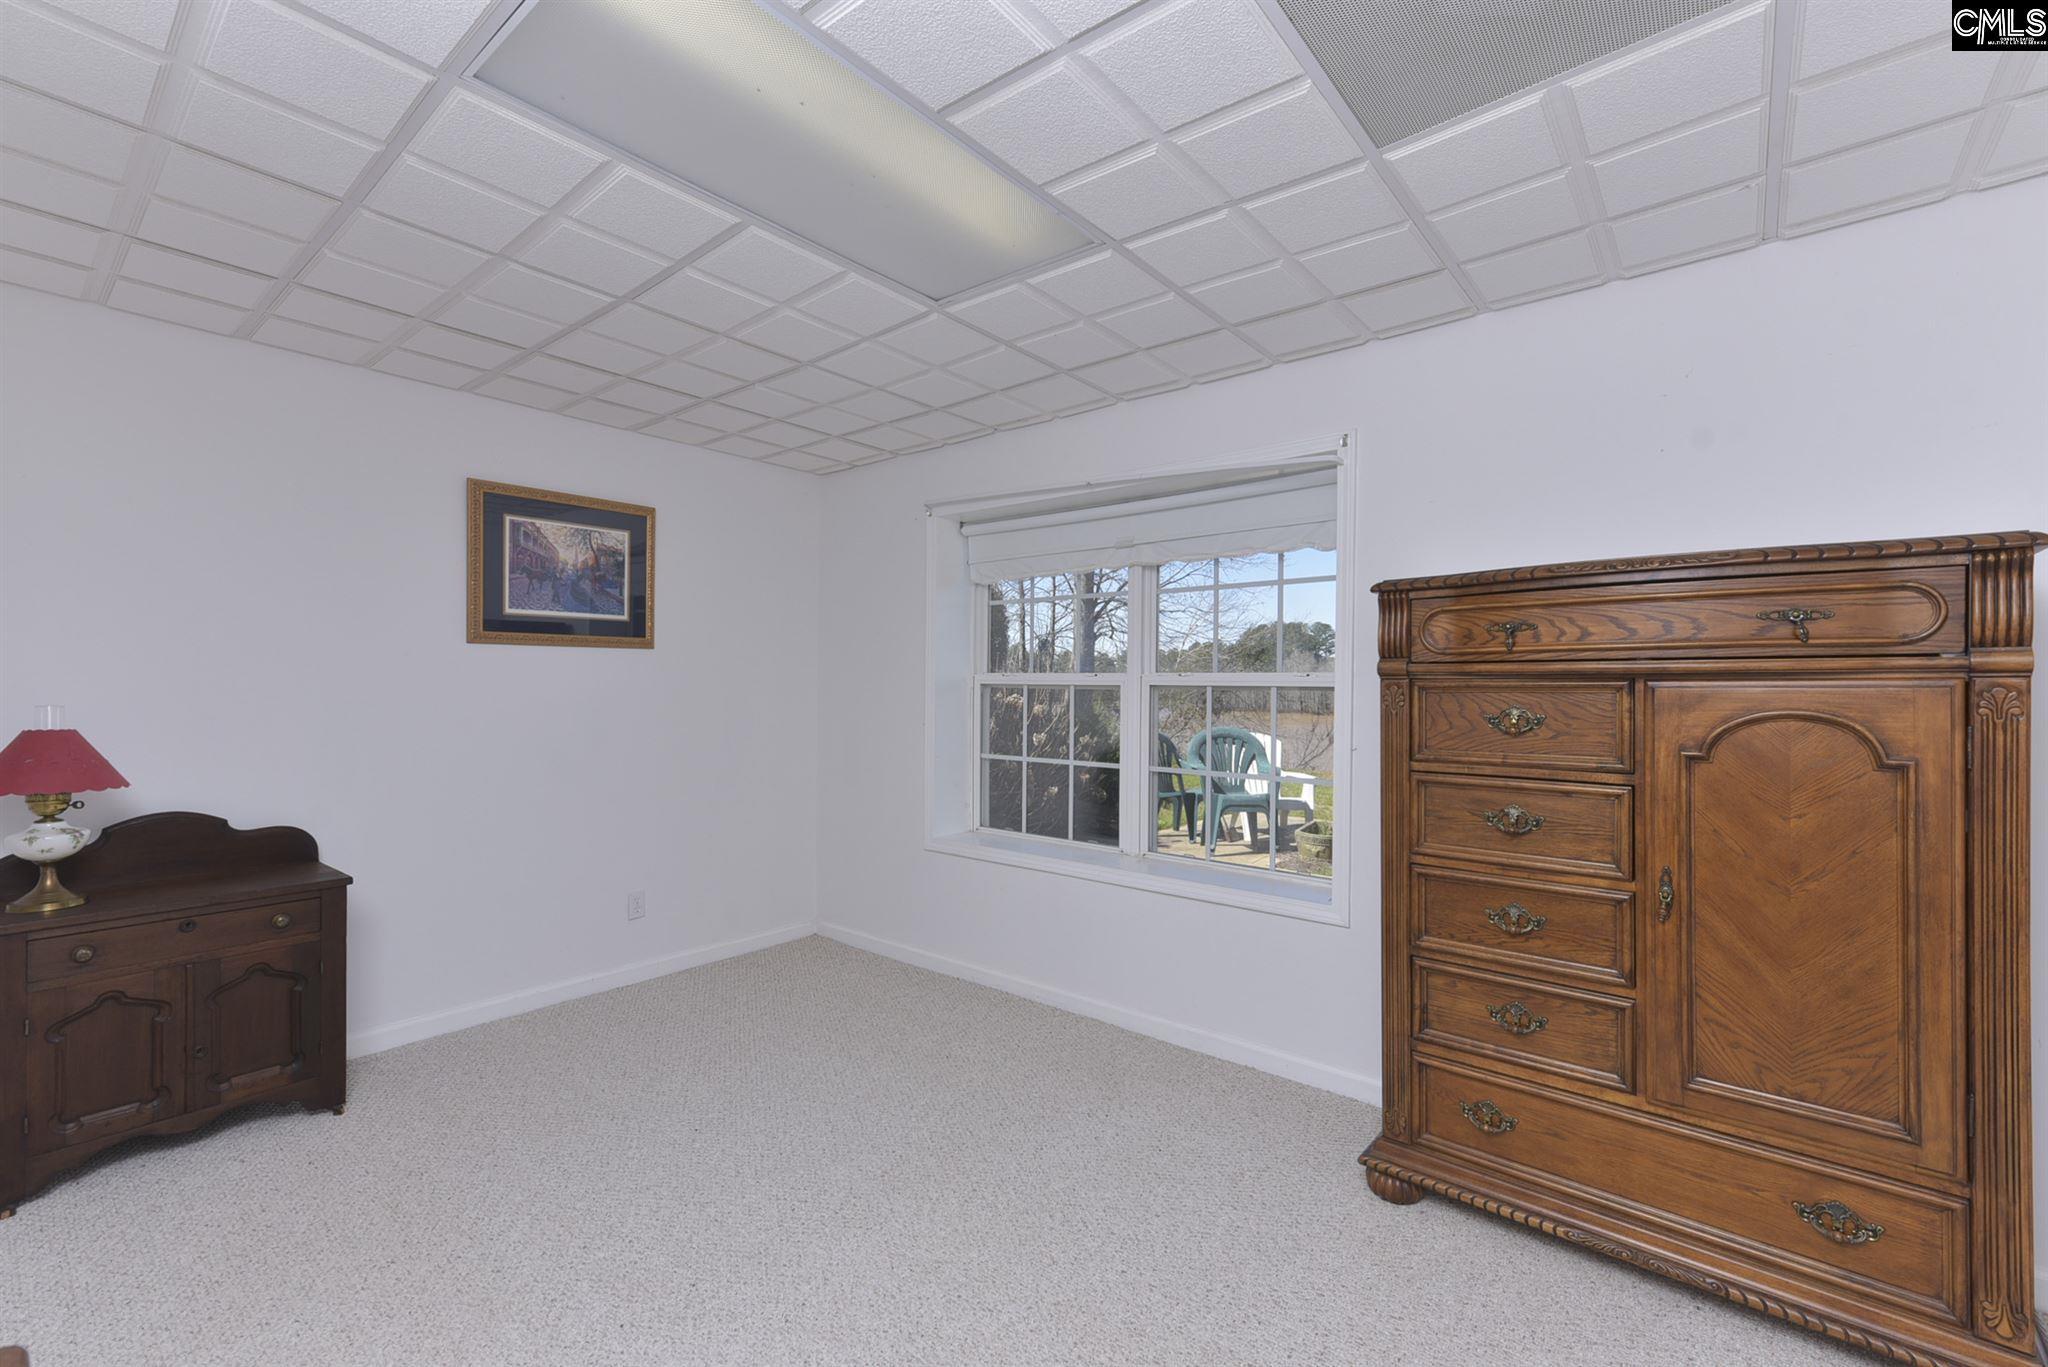 2165 Great North Winnsboro, SC 29180